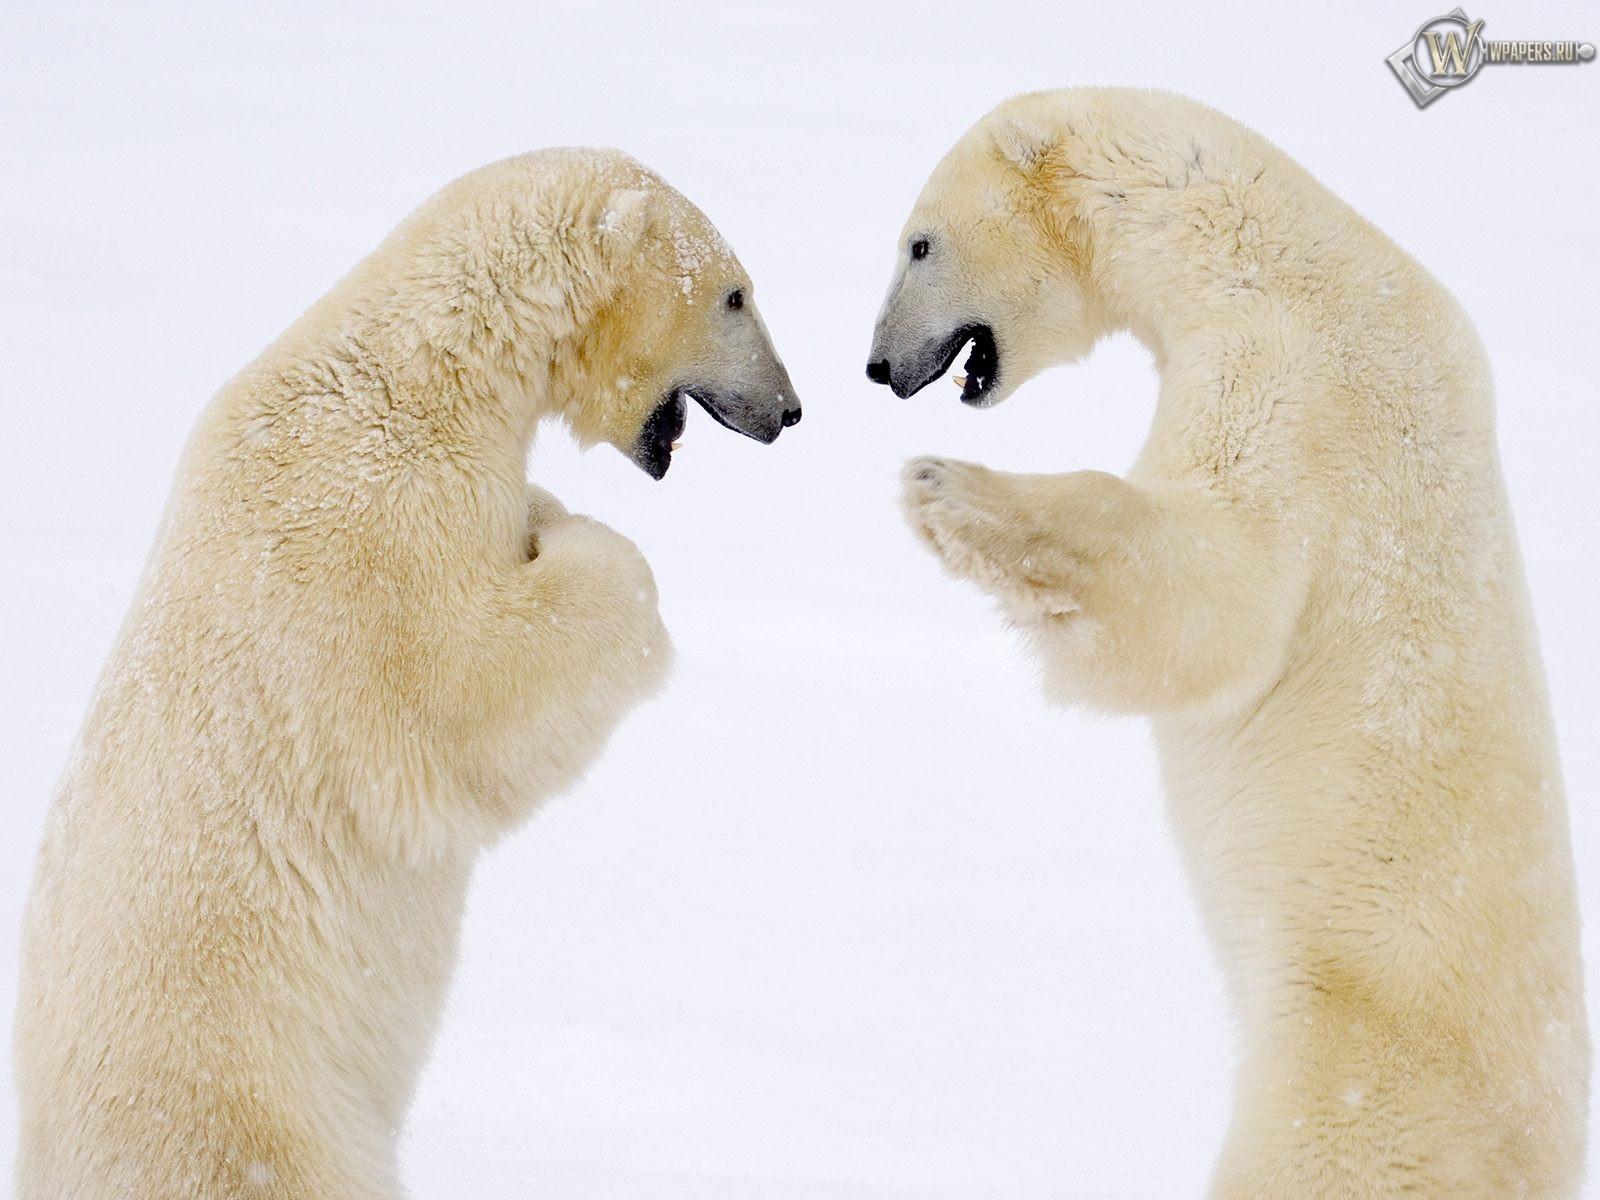 Белые медведи дерутся 1600x1200